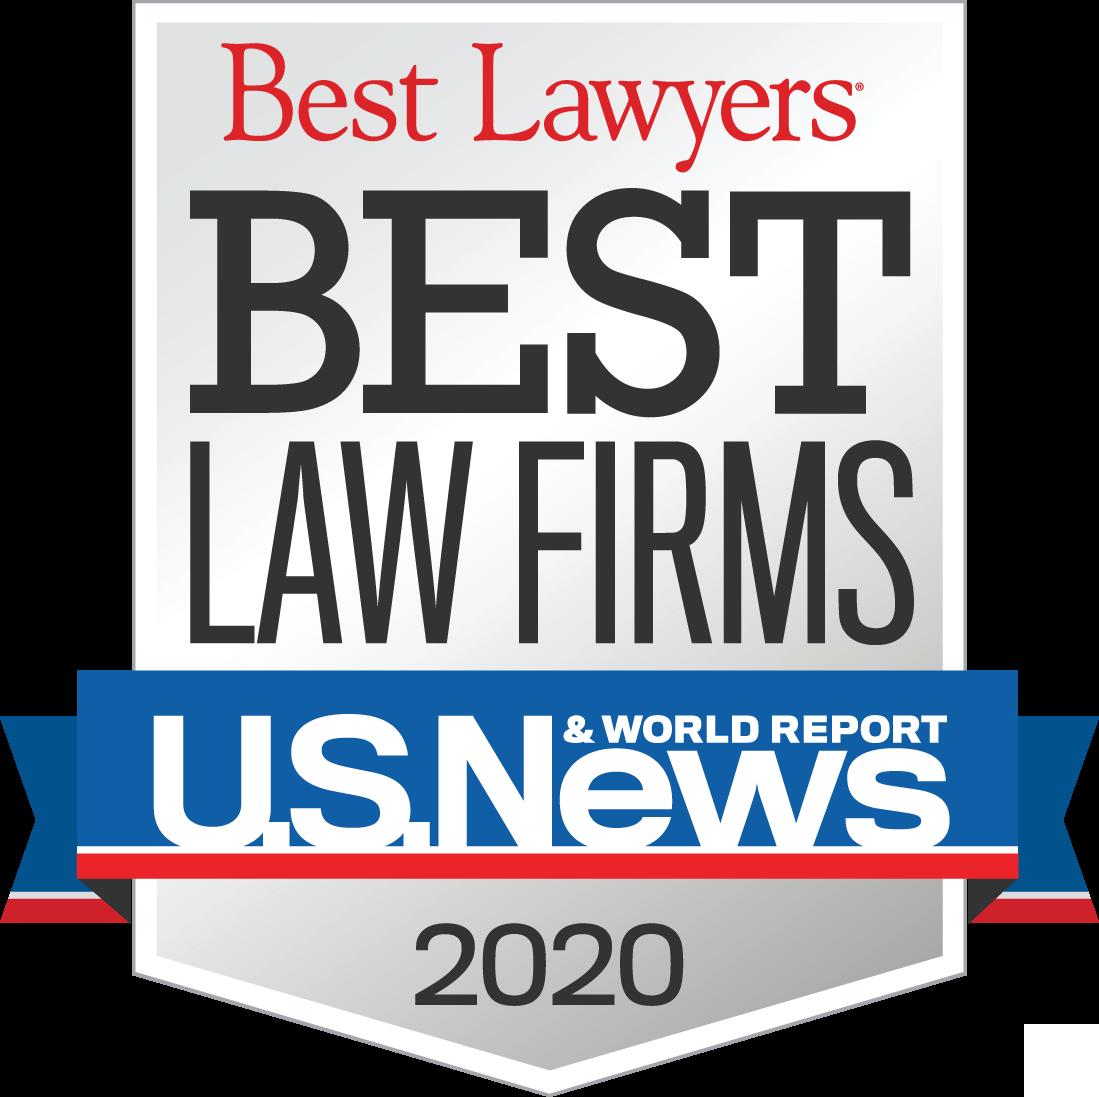 Best Lawyers - US News 2019